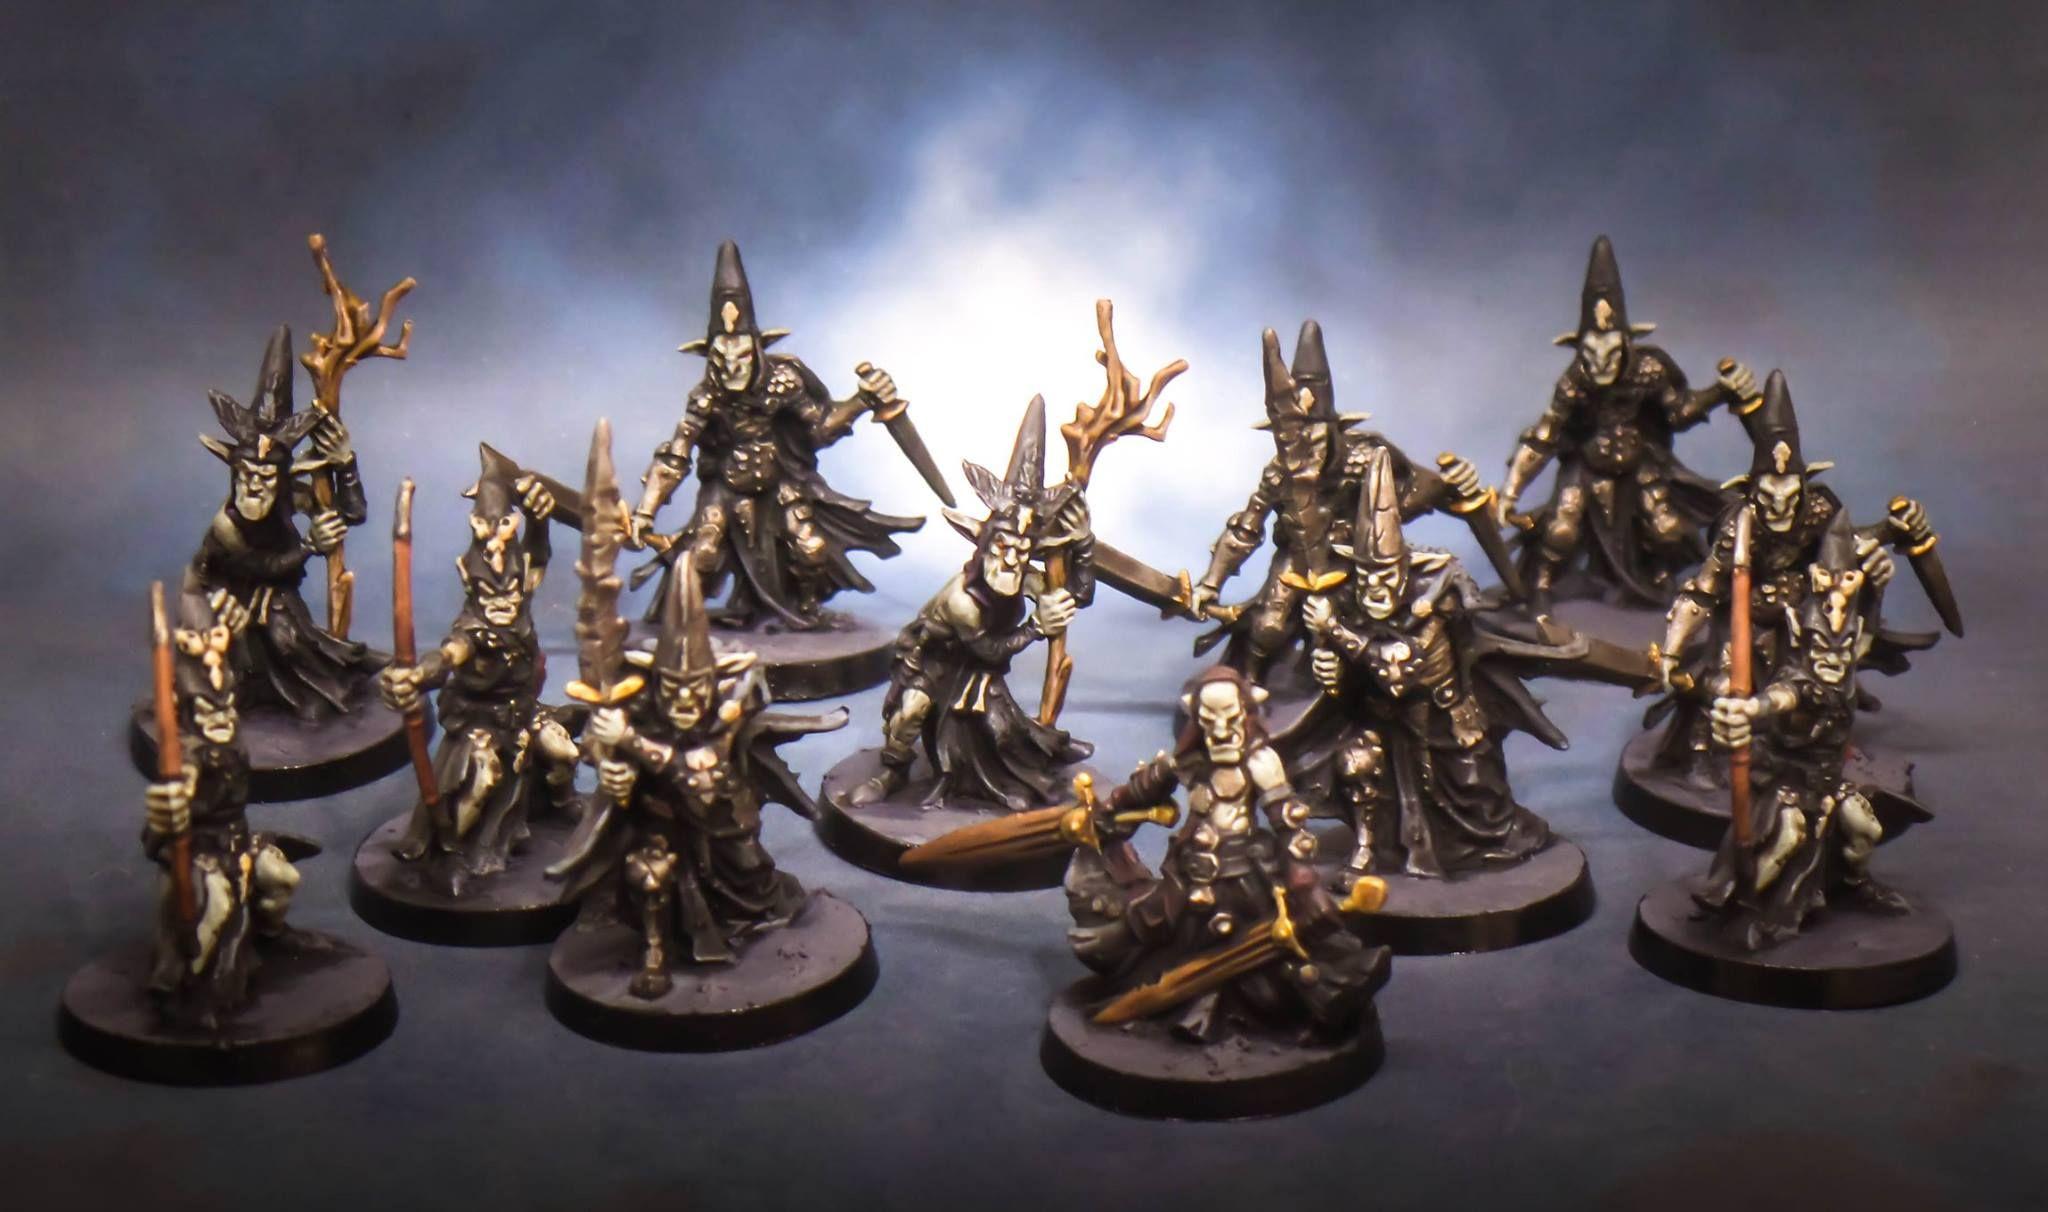 Massive Darkness Goblins